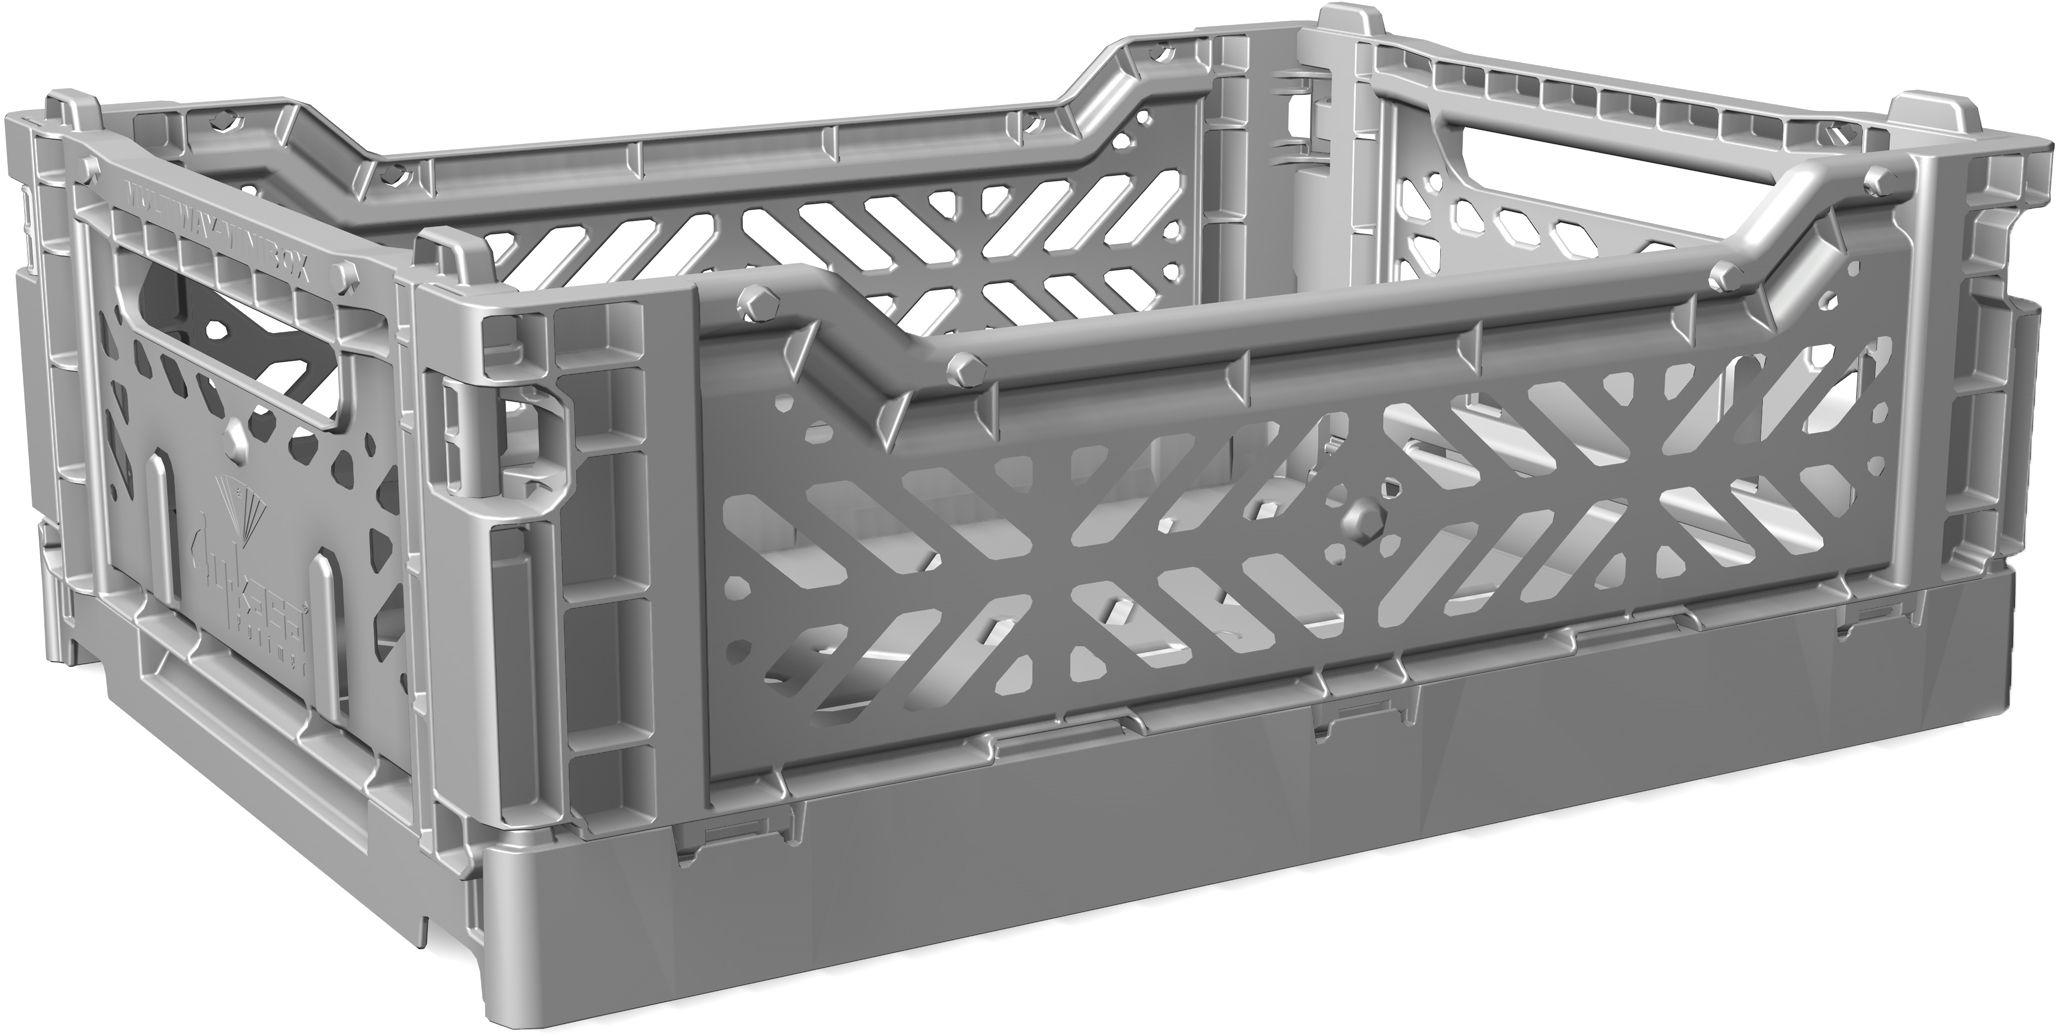 midi box storage rack foldable l 40 cm grey by surplus. Black Bedroom Furniture Sets. Home Design Ideas